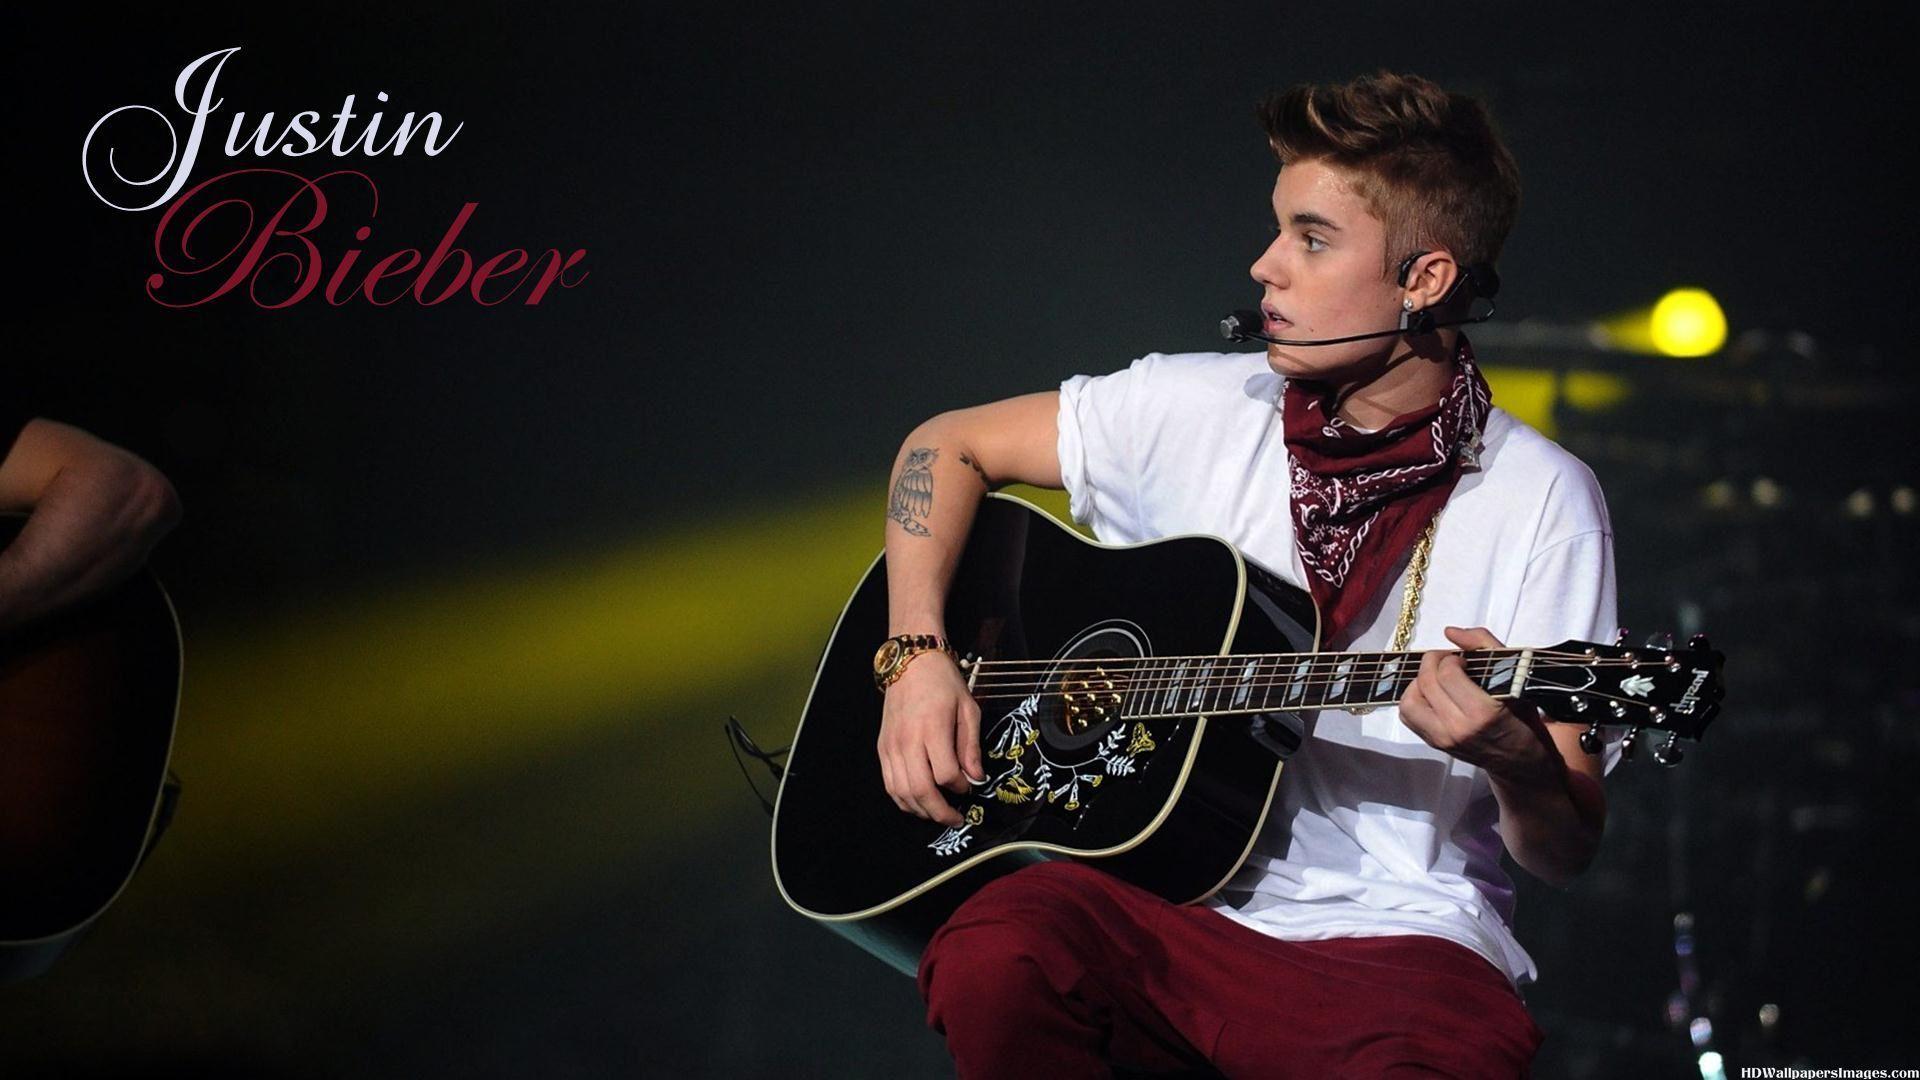 Justin Bieber 2015 Wallpapers 1920x1080